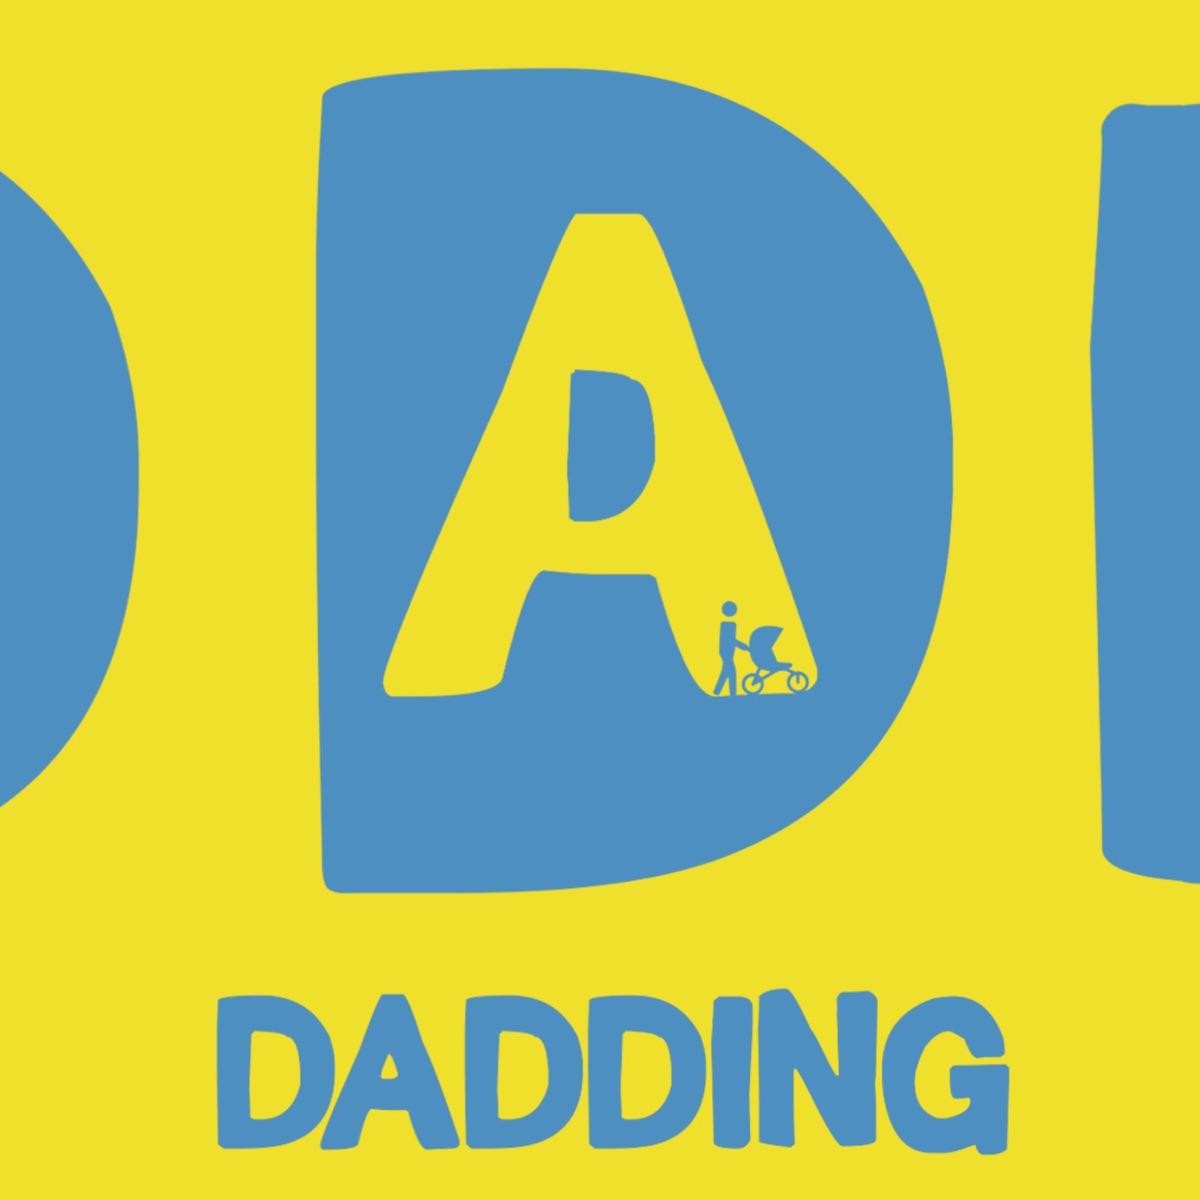 Dadding